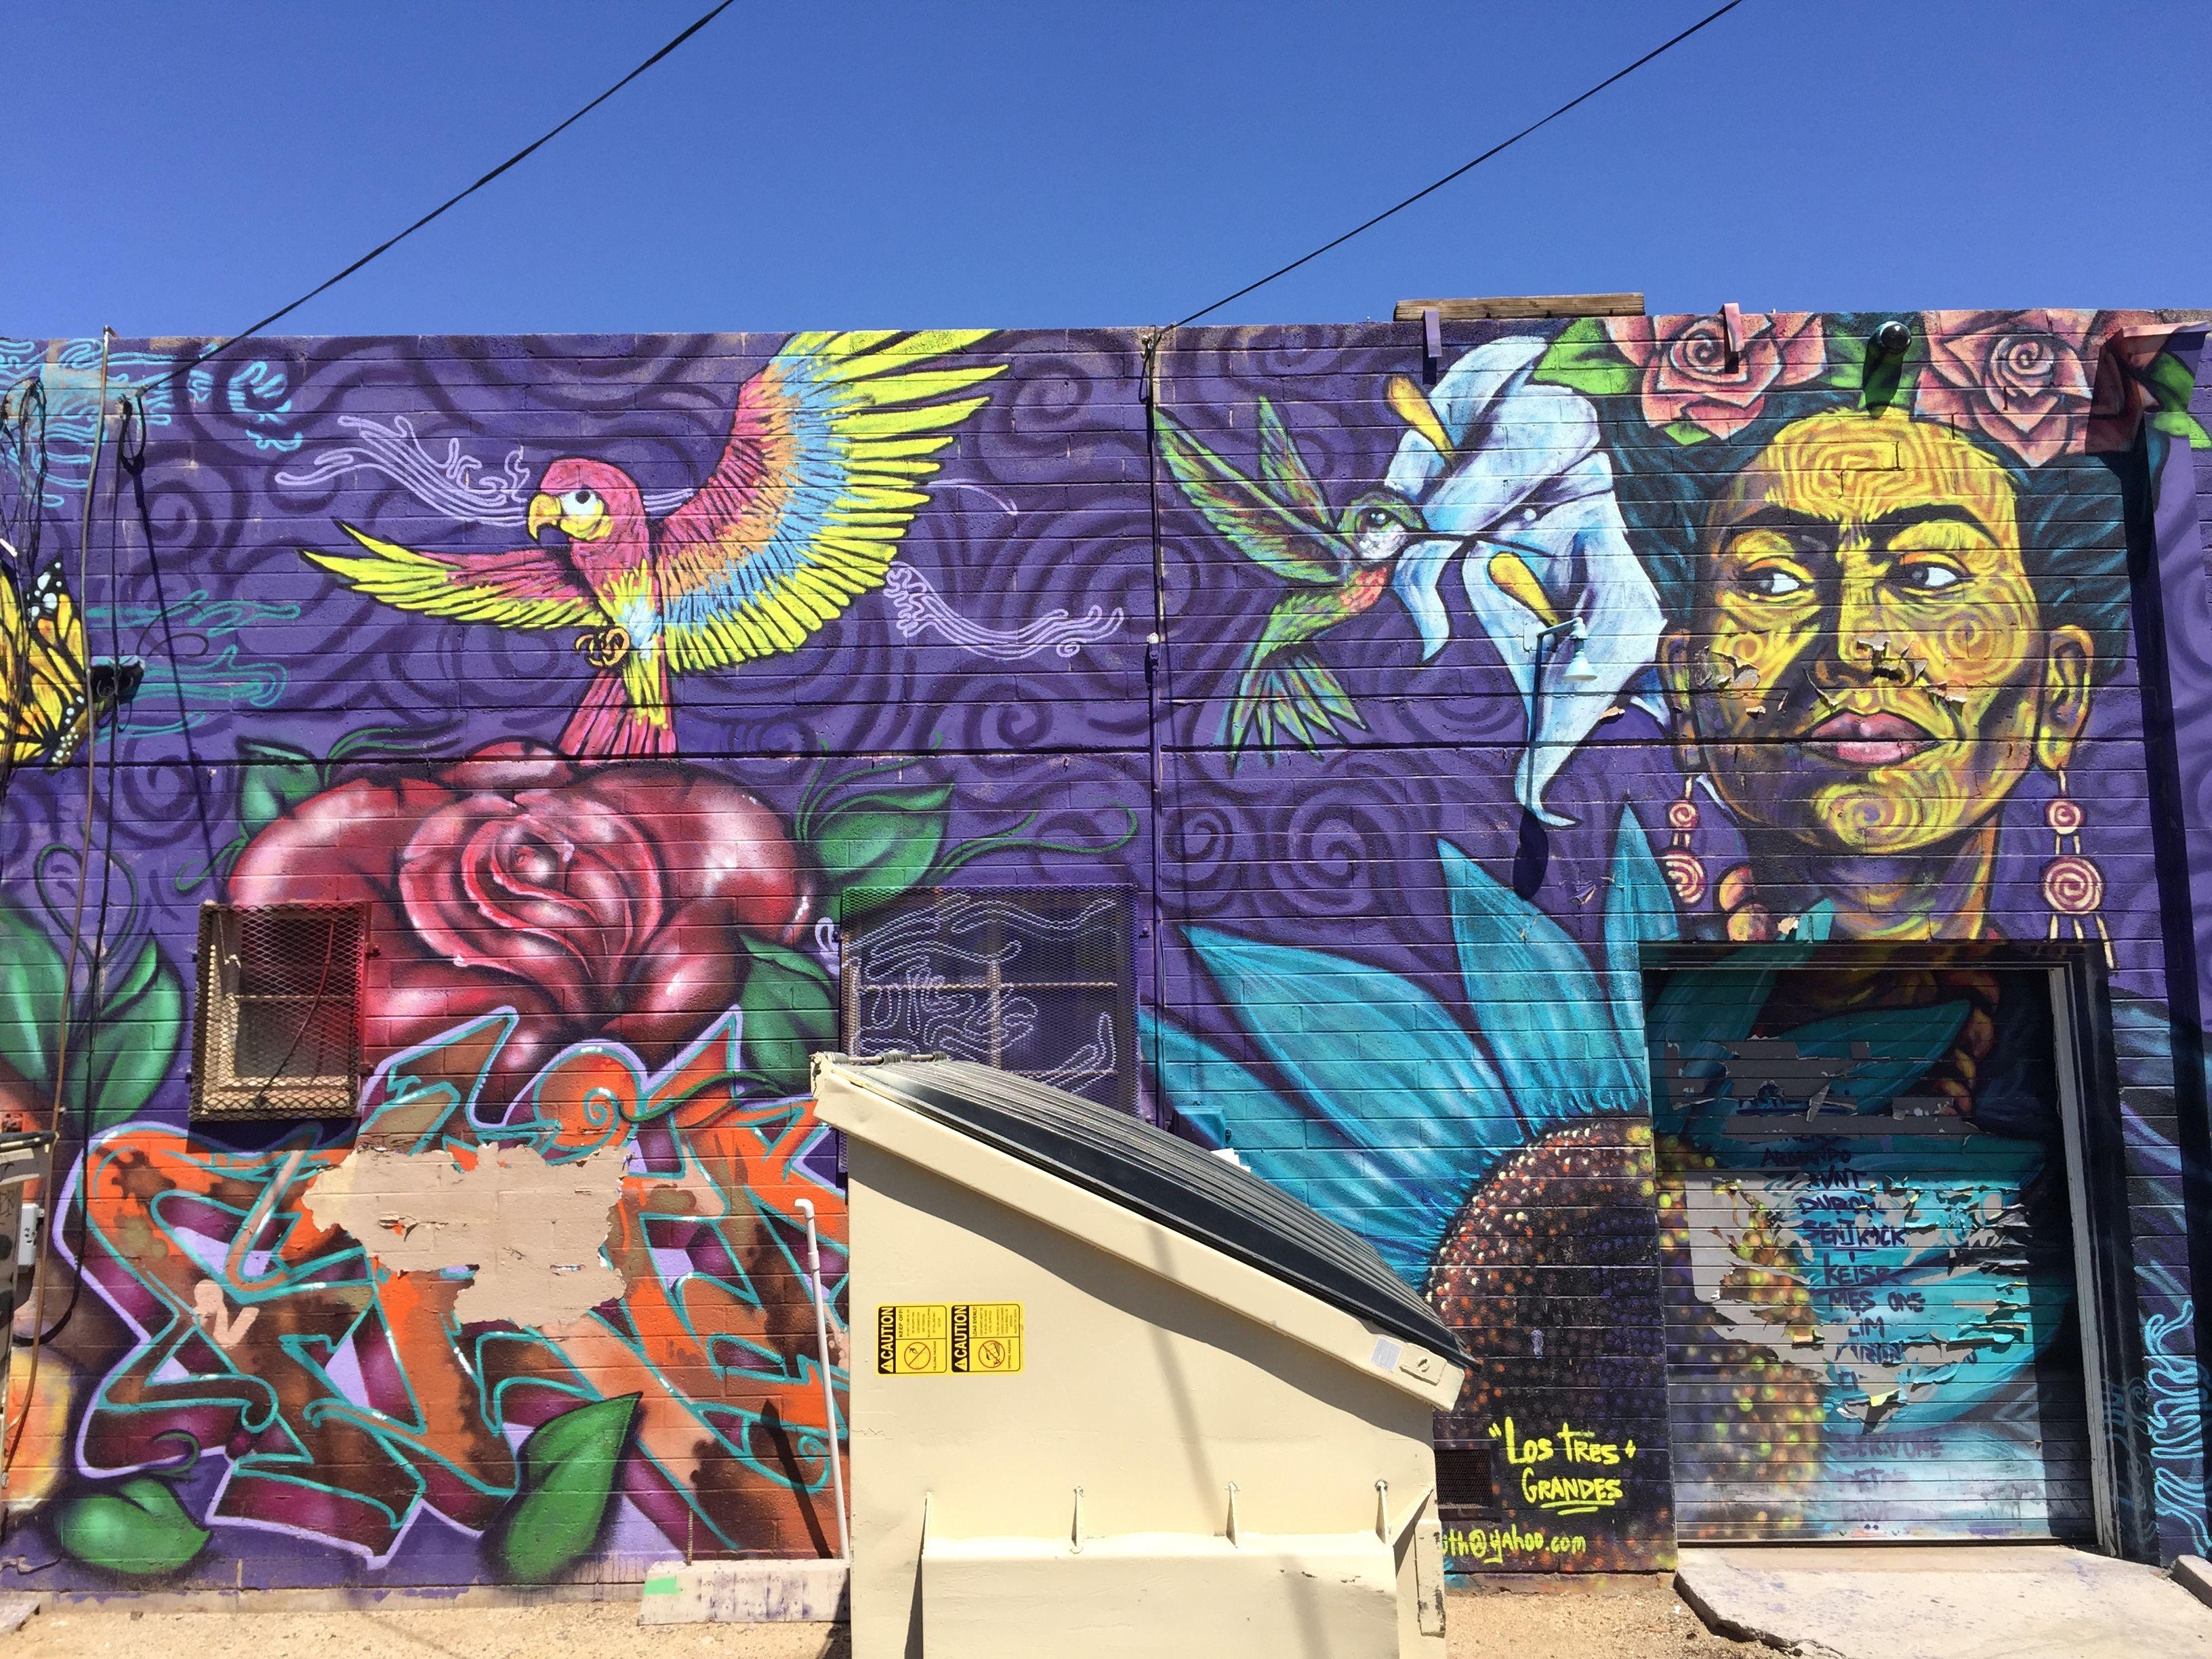 Phoenix Condos For Sale Arizona Condos For Sale Scottsdale Condos Urban Art Street Art Photography Art